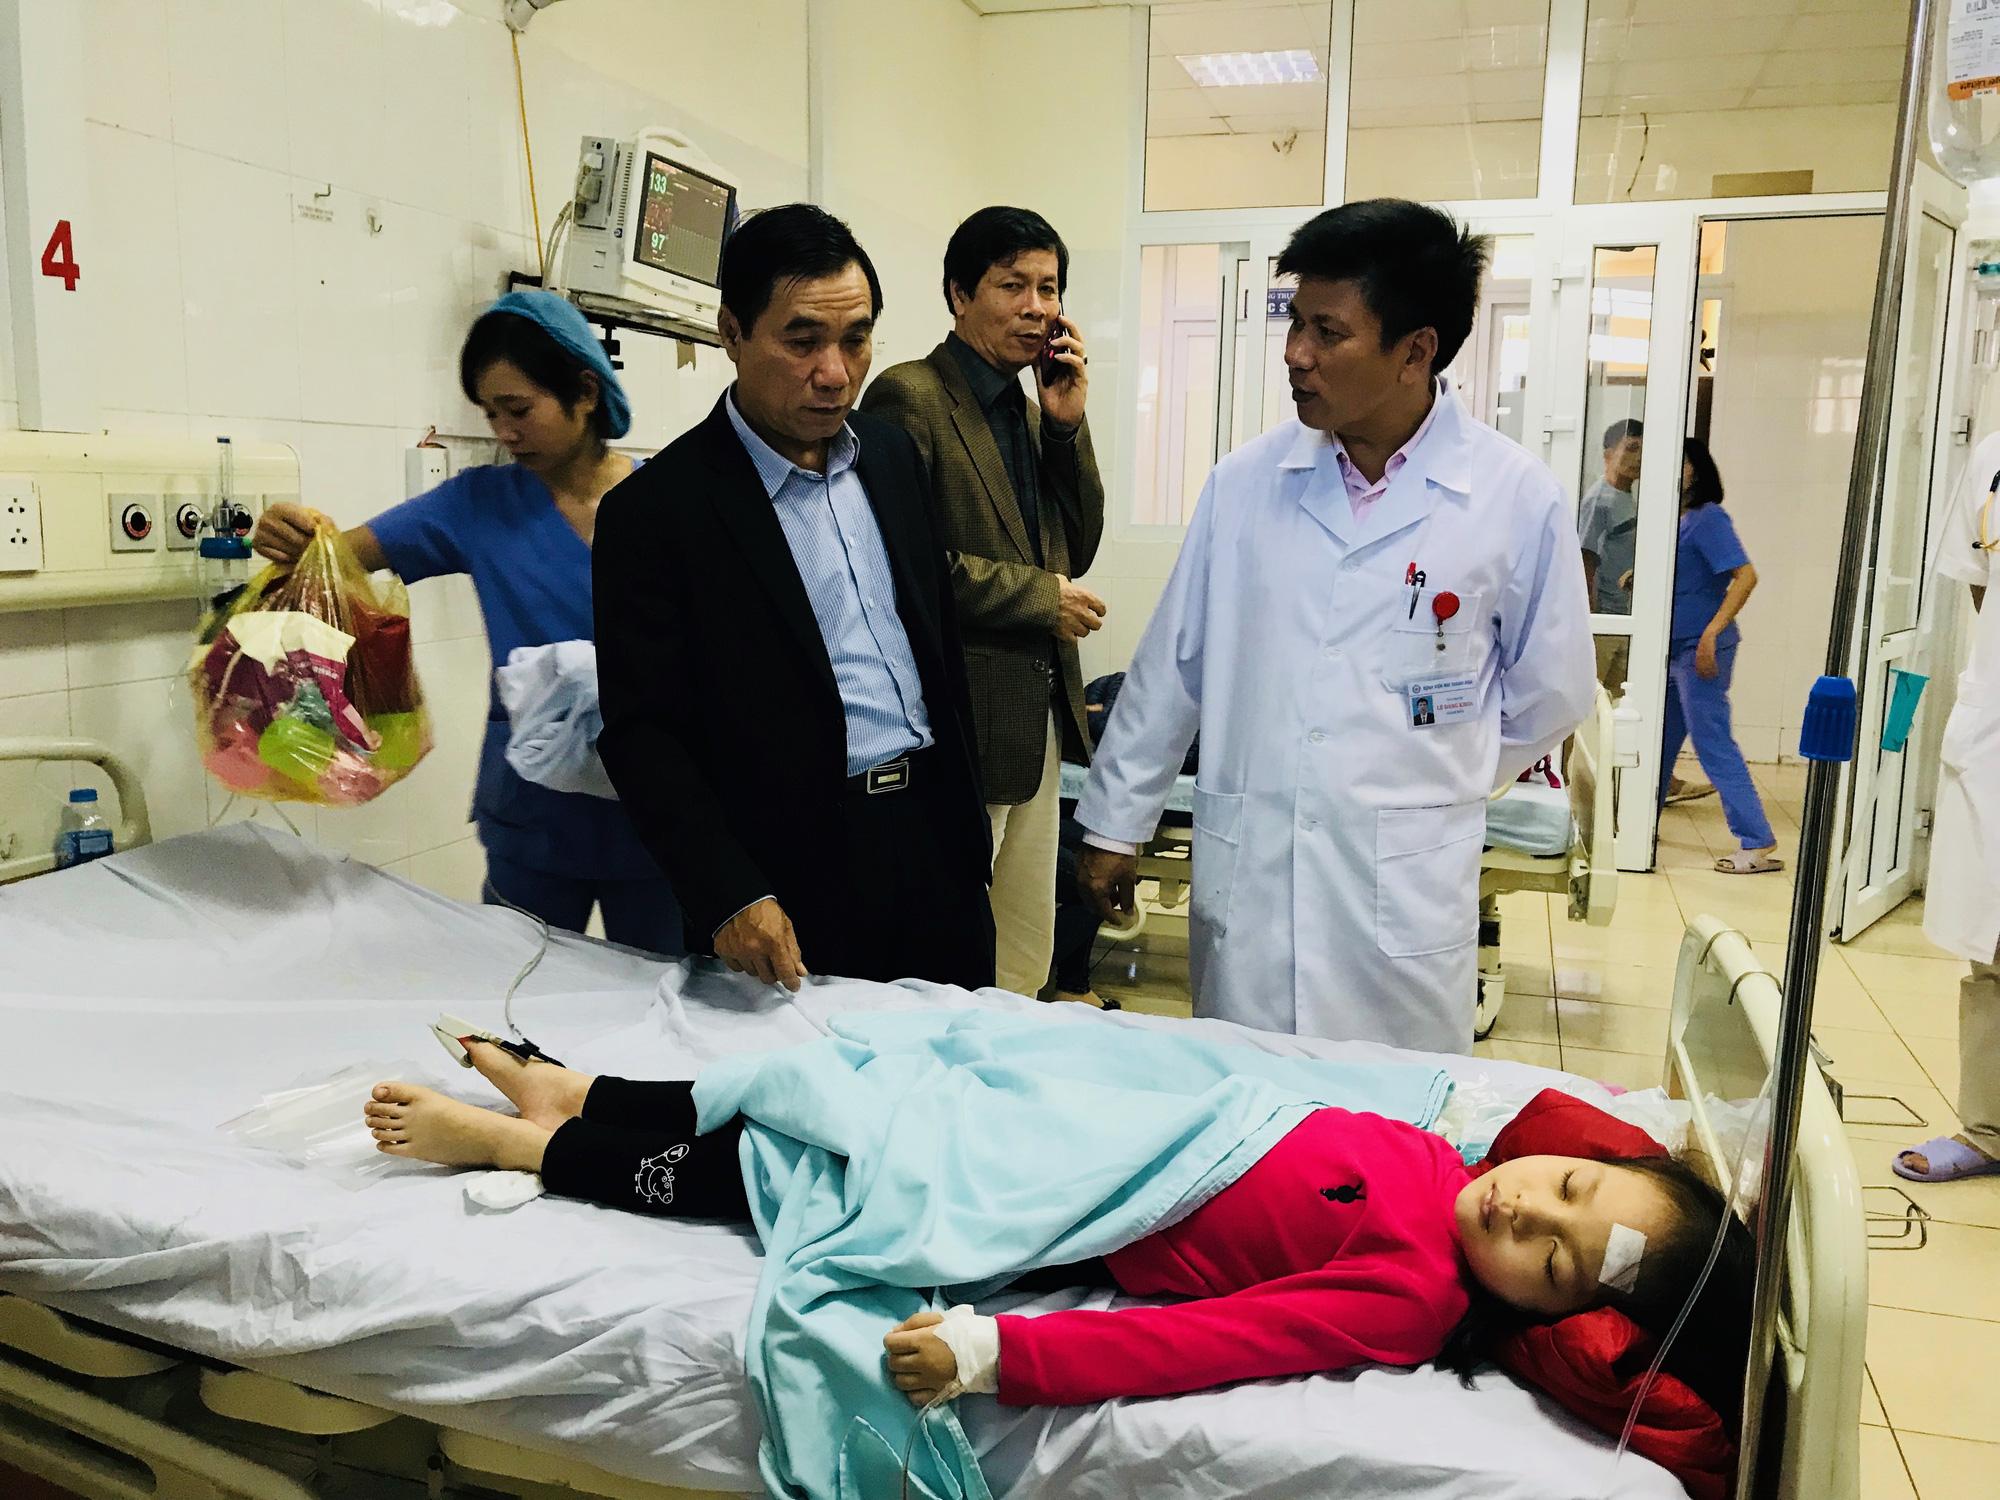 130 kindergarteners hospitalized for suspected food poisoning in Vietnam